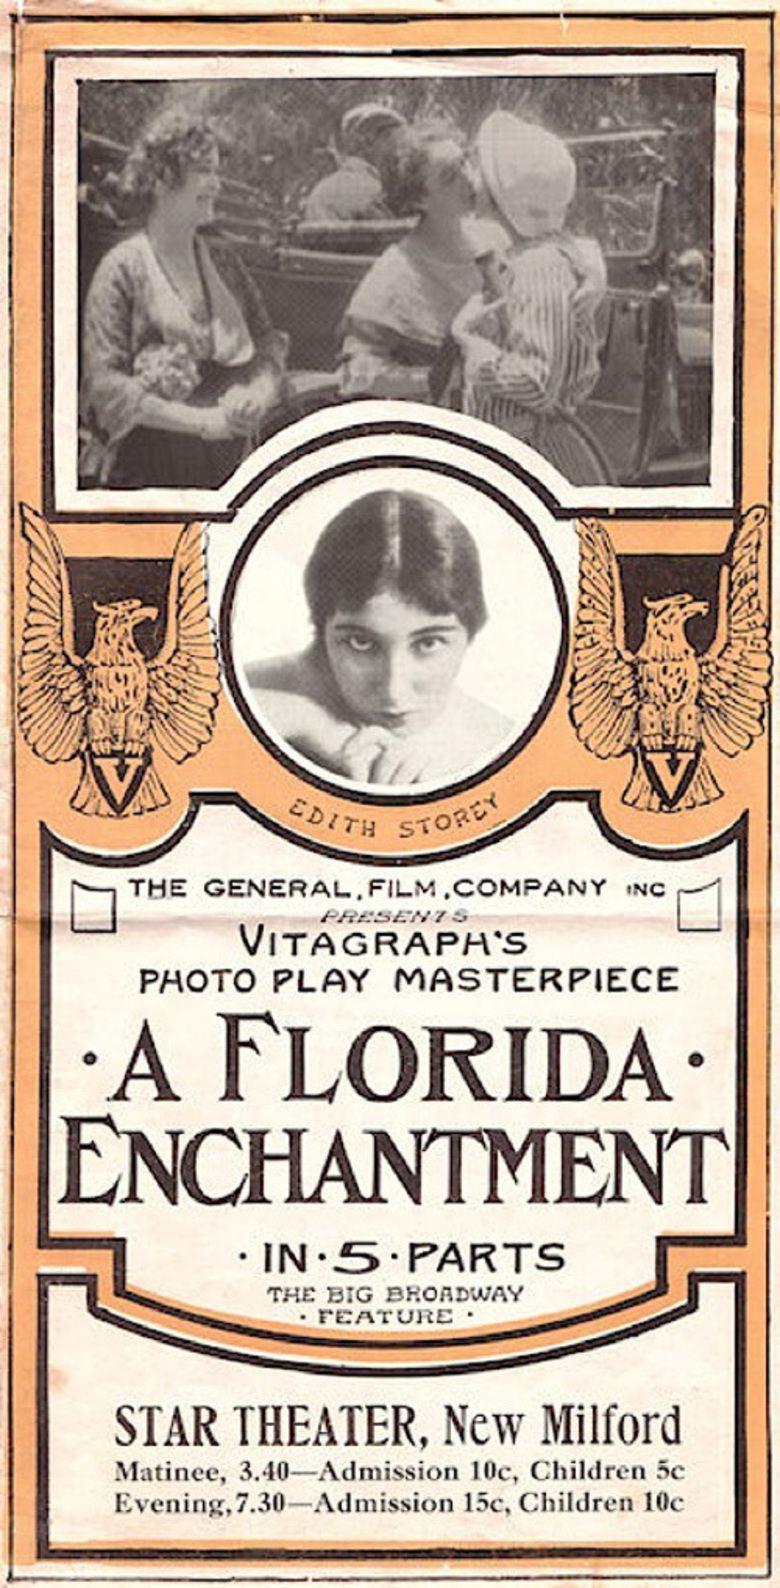 A Florida Enchantment movie poster